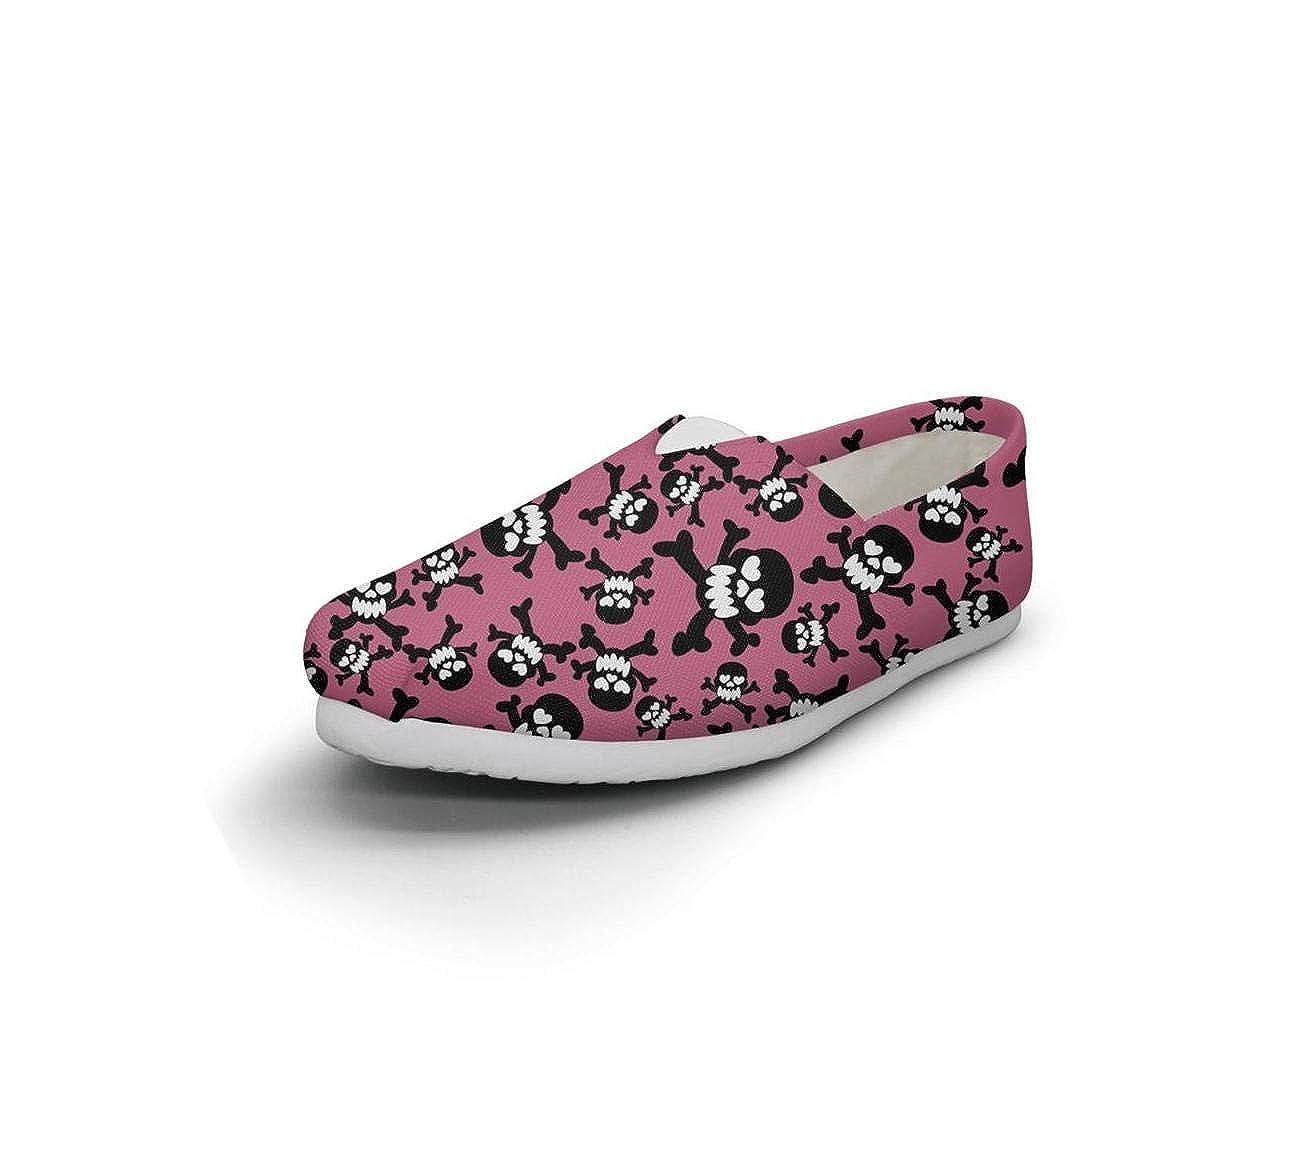 HappyWomen Skull DeviantArt Design Fairytale Princess Womens Comfort Flat Walking Sneakers Girls Espadrille Flats